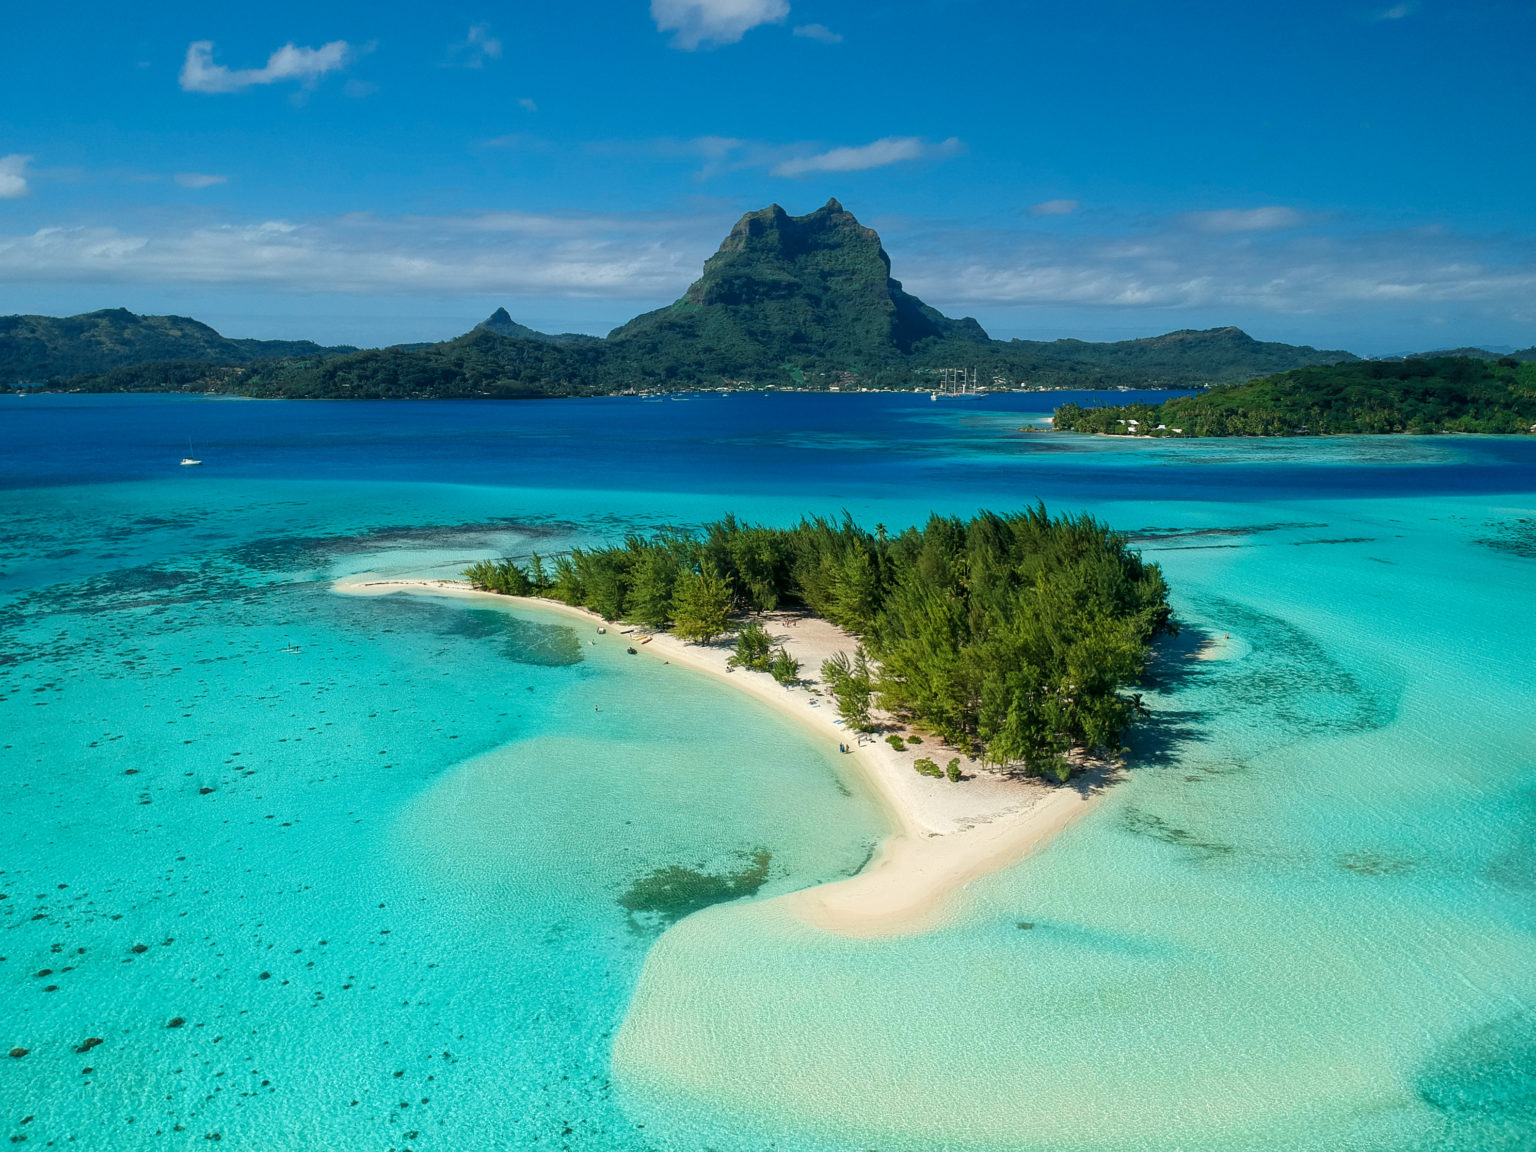 Bora_Bora_in_Tahiti_TravellersofIndia